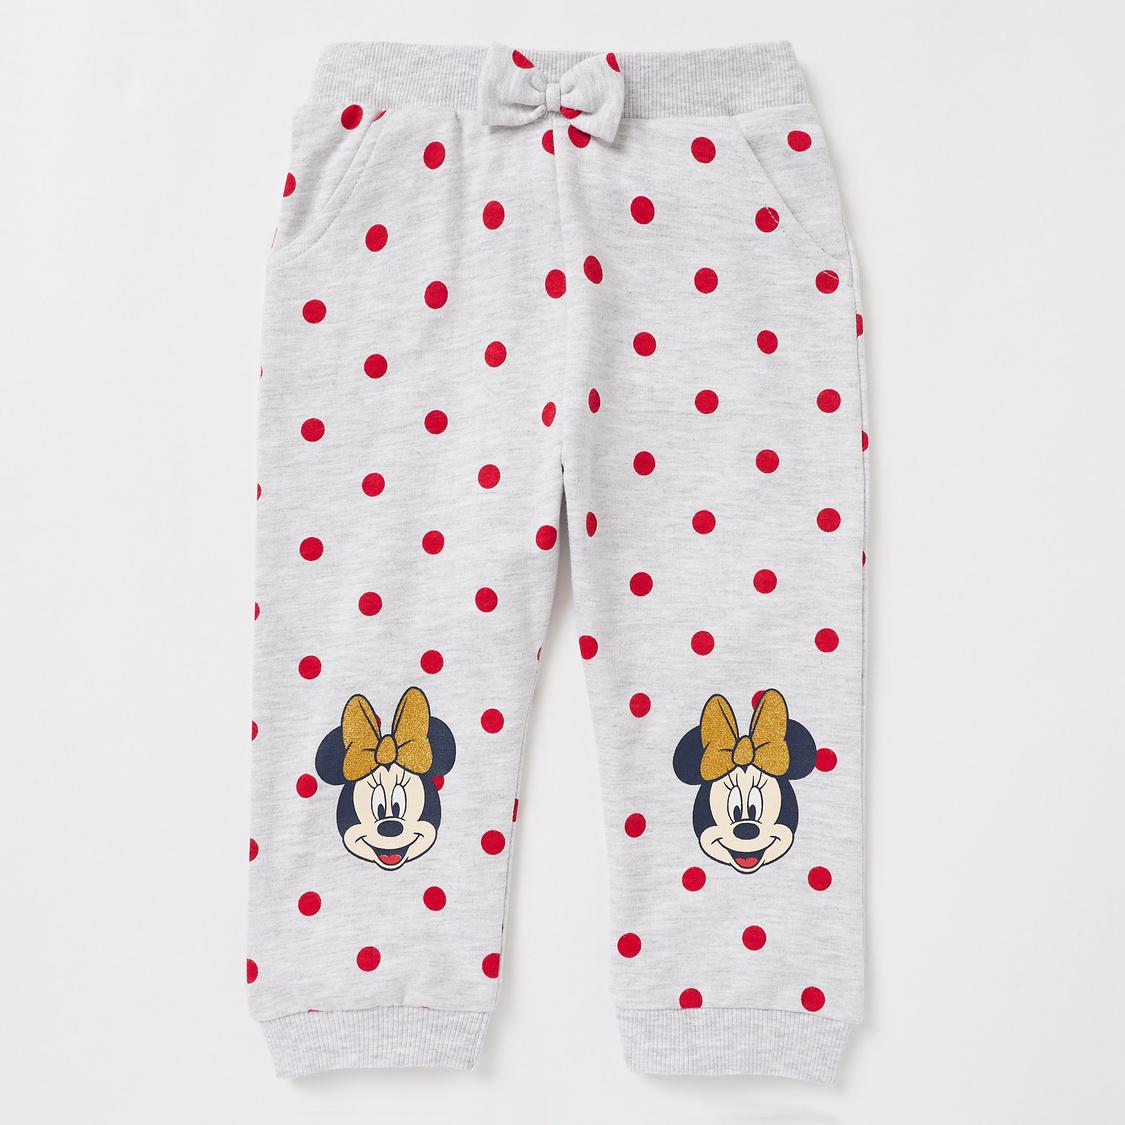 All-Over Minnie Mouse Print Sweatshirt and Full Length Jog Pants Set